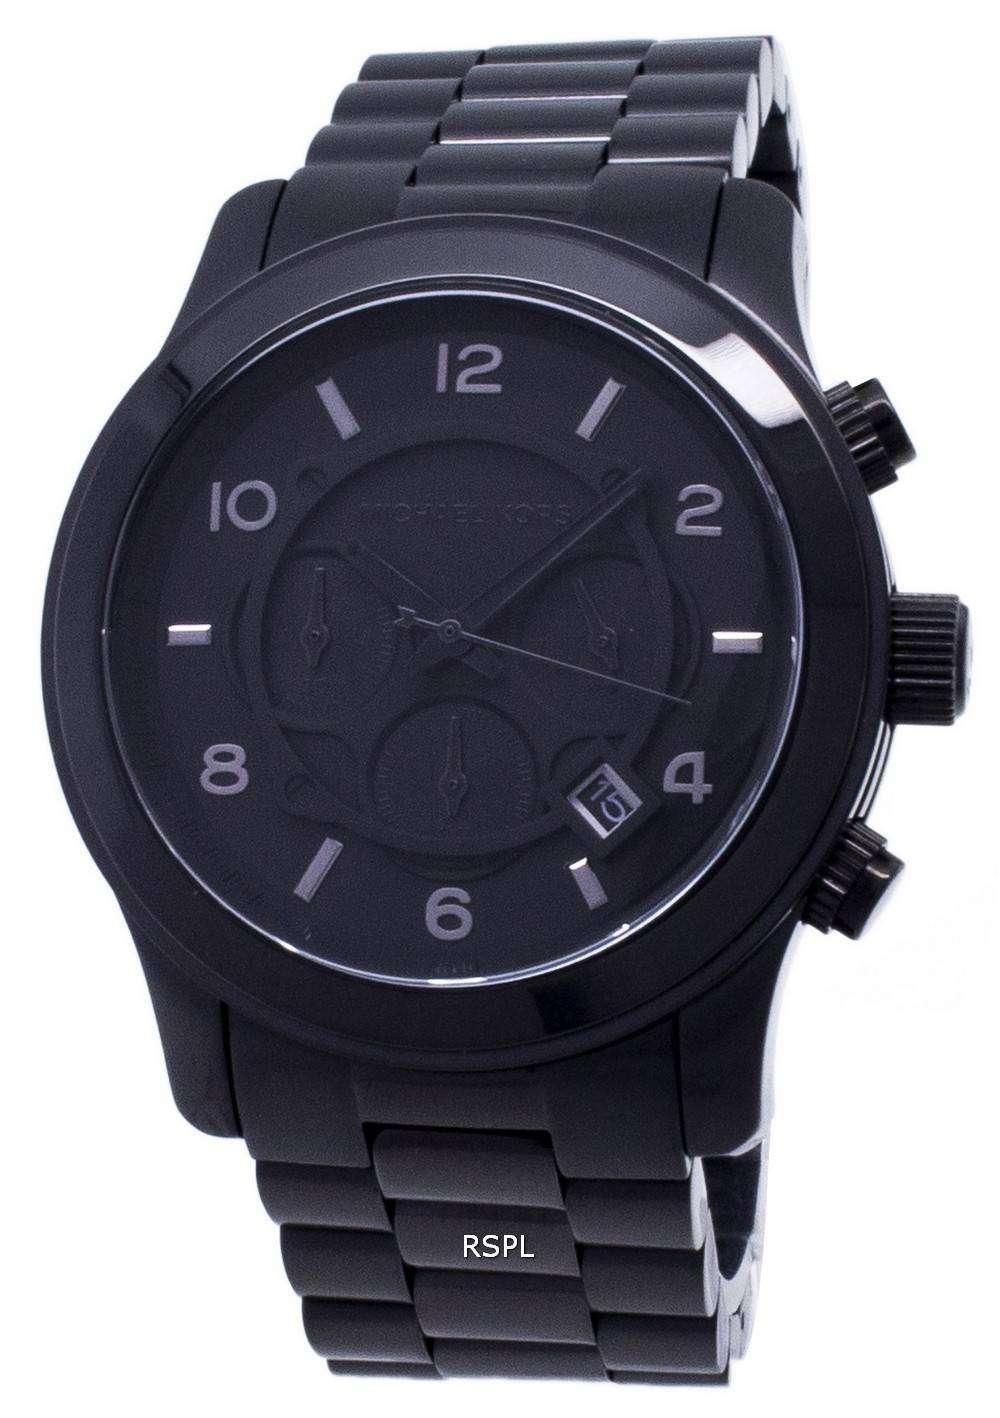 7e5f7c33b9d4 Michael Kors Blacked Out Runway Chronograph MK8157 Mens Watch ...